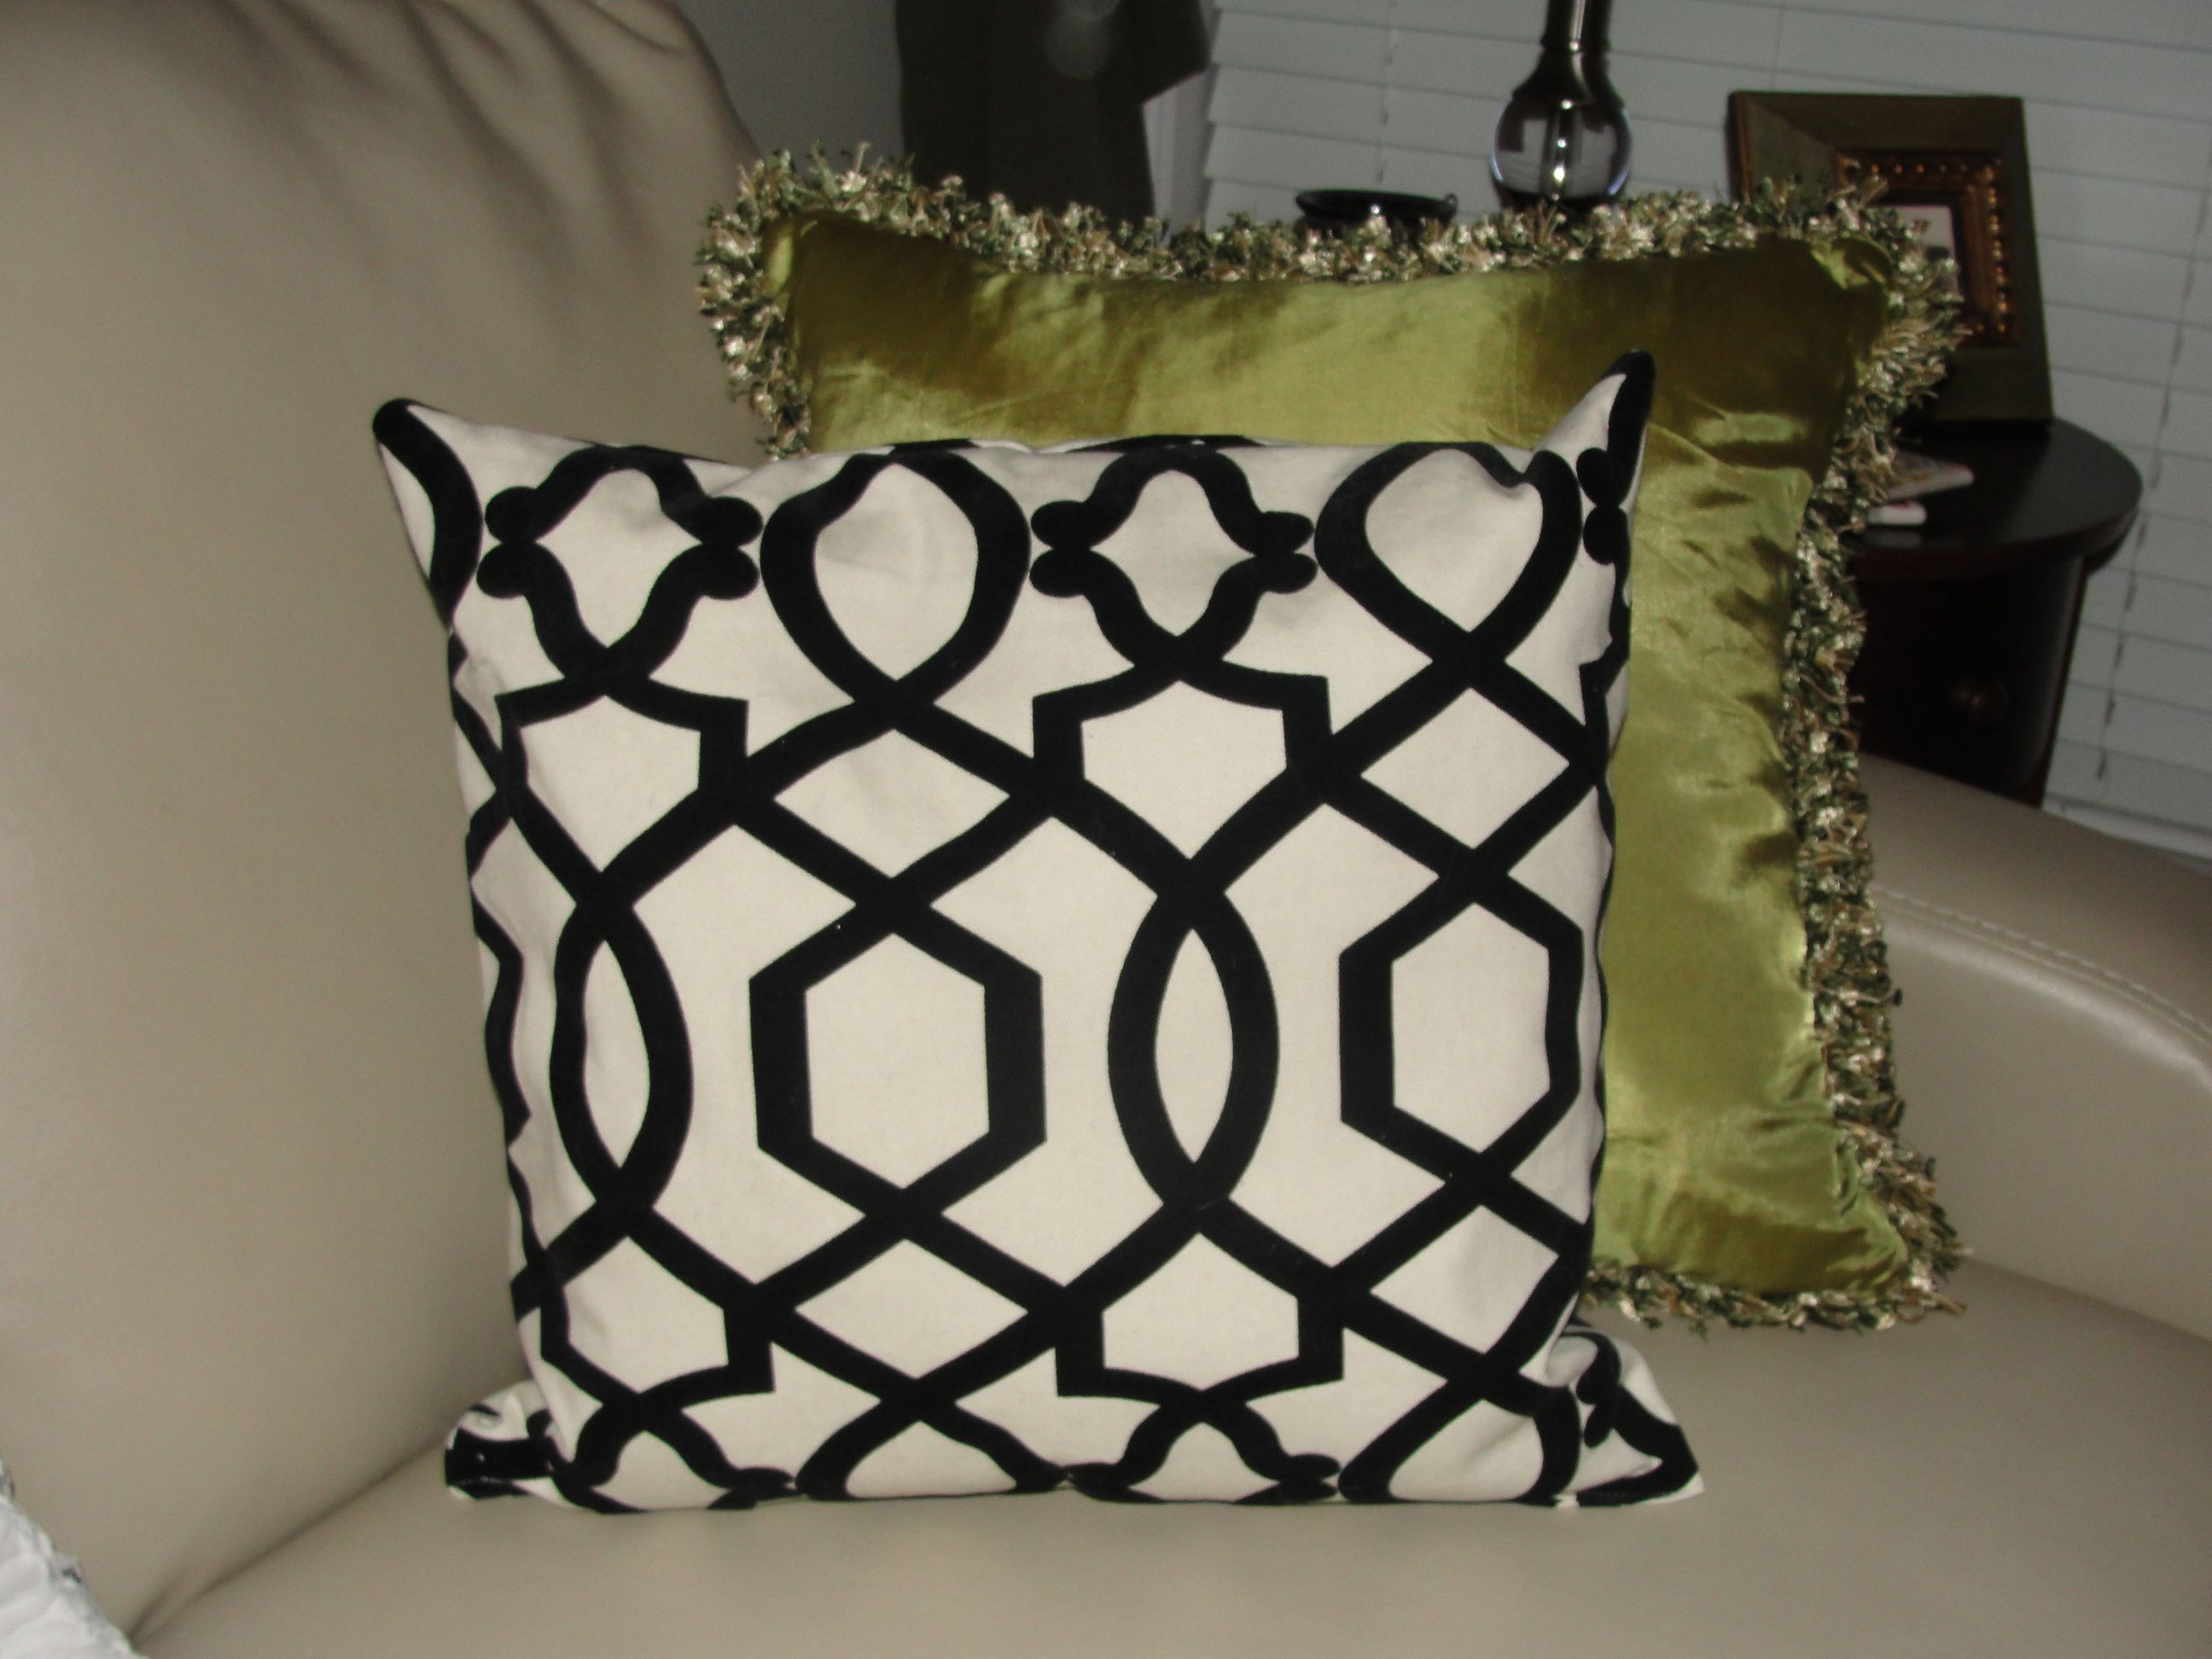 Iman fabric artisticfabrics.com